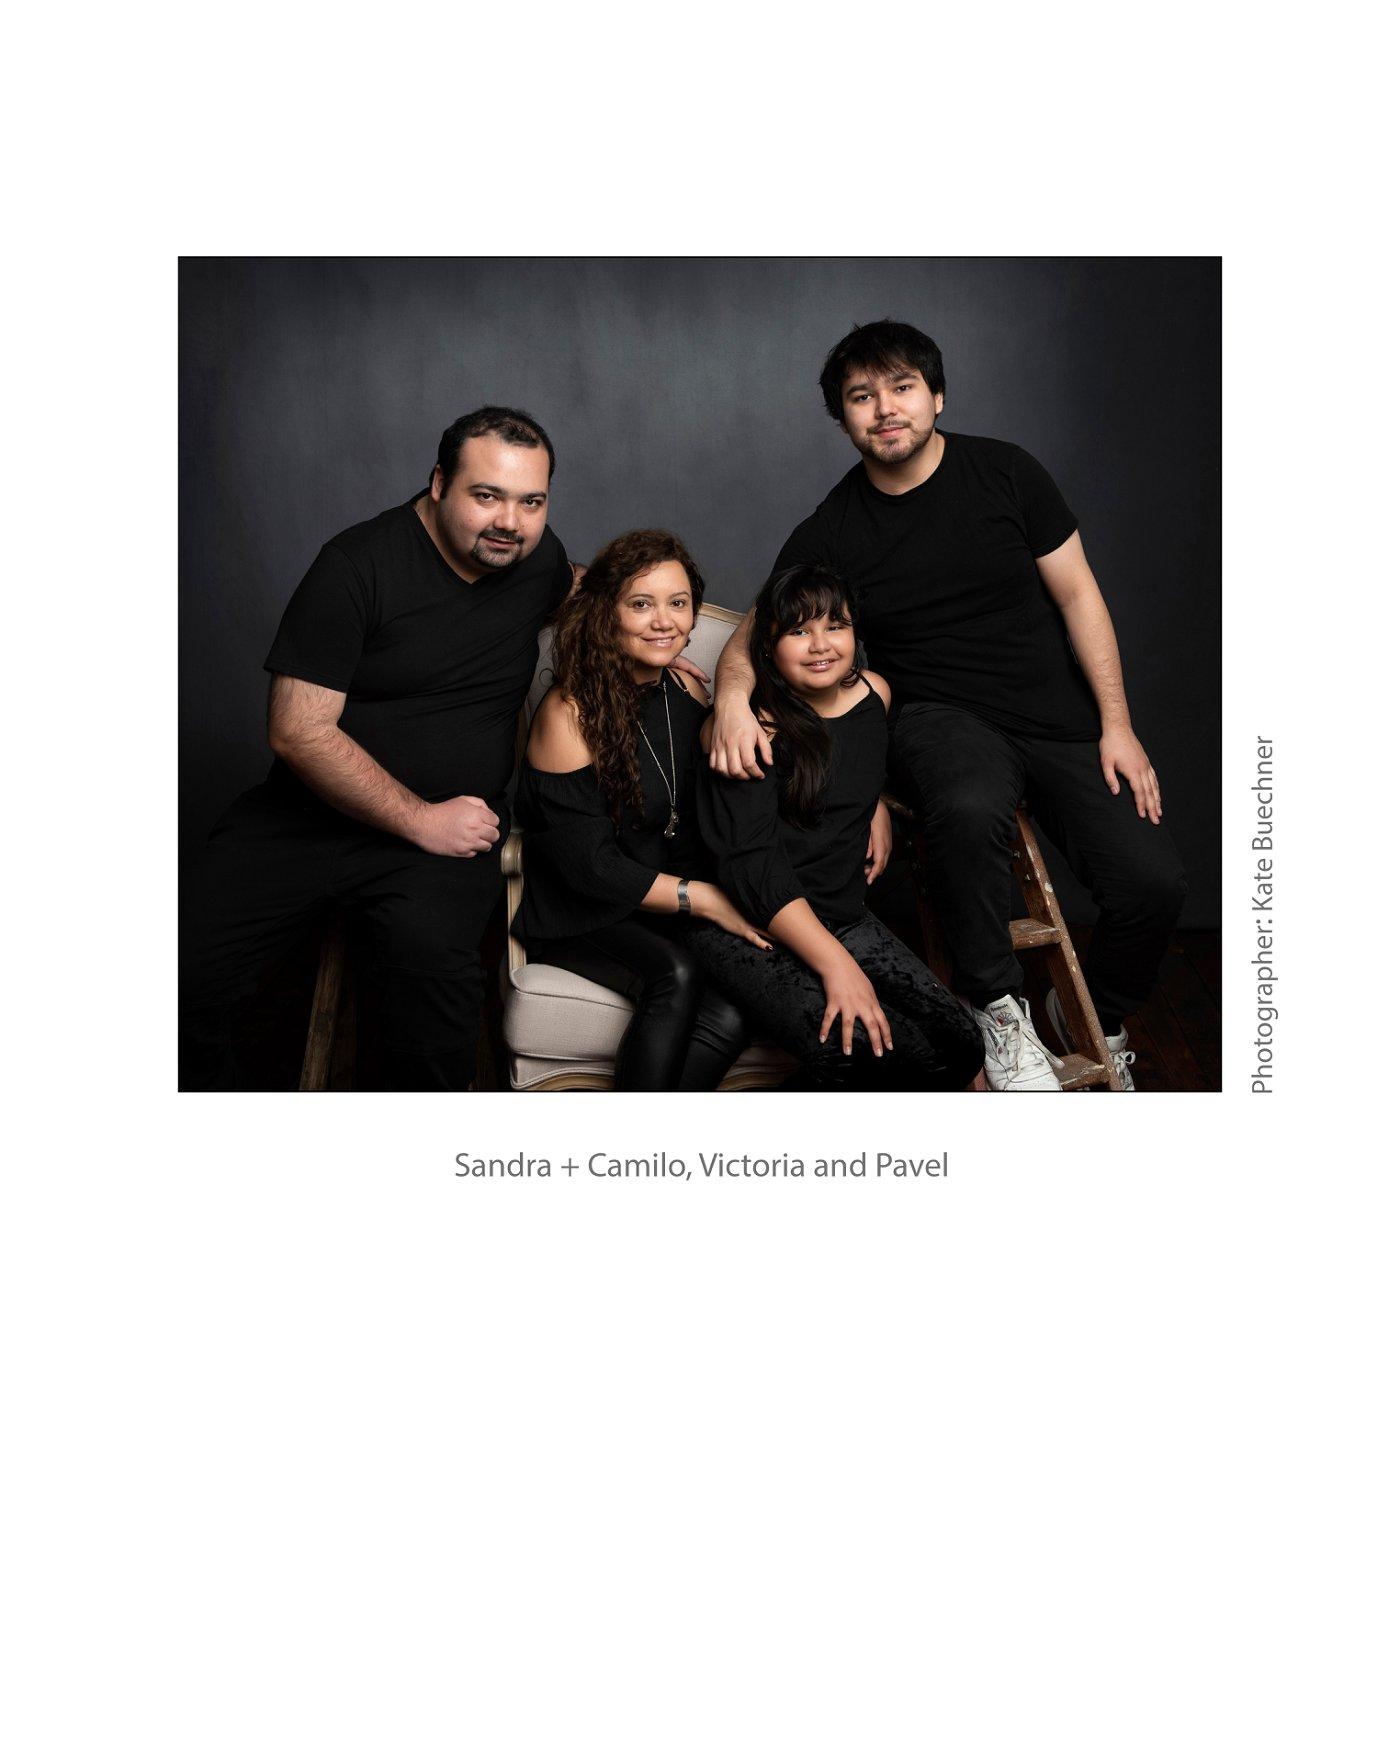 family photographer sydney (10).jpg